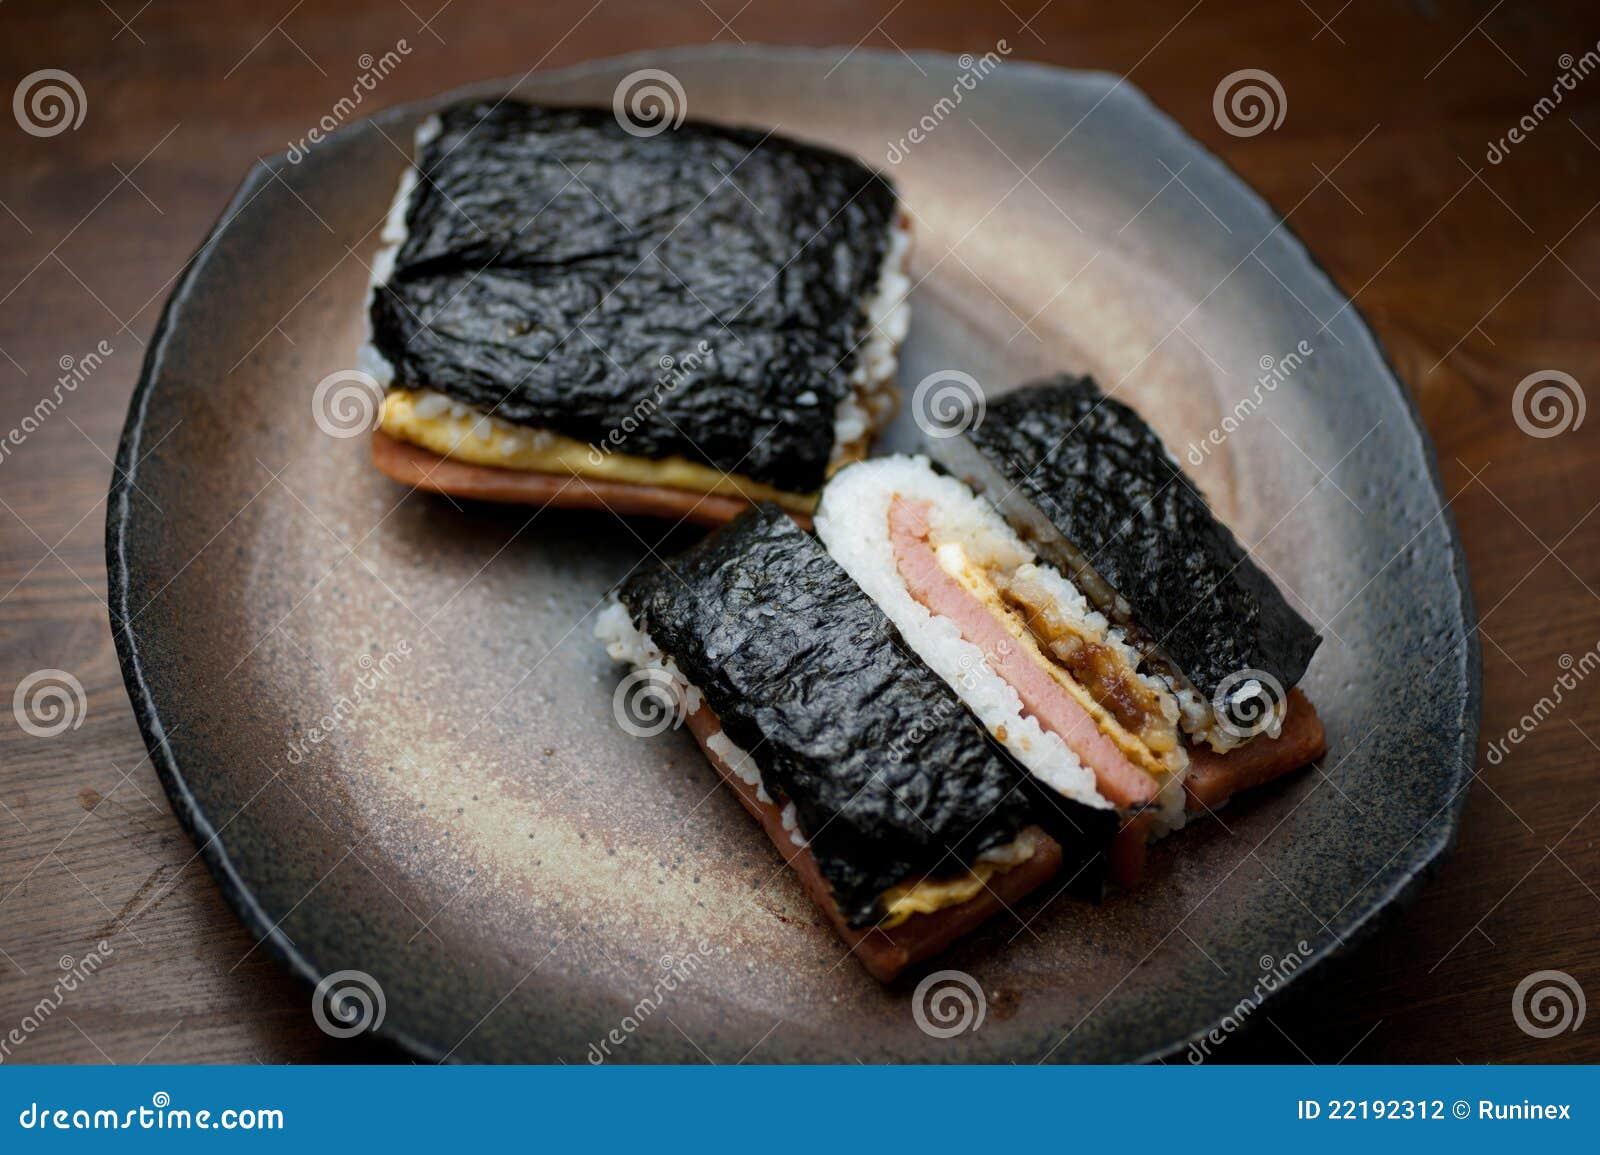 Japanese cuisine pork tamago onigiri